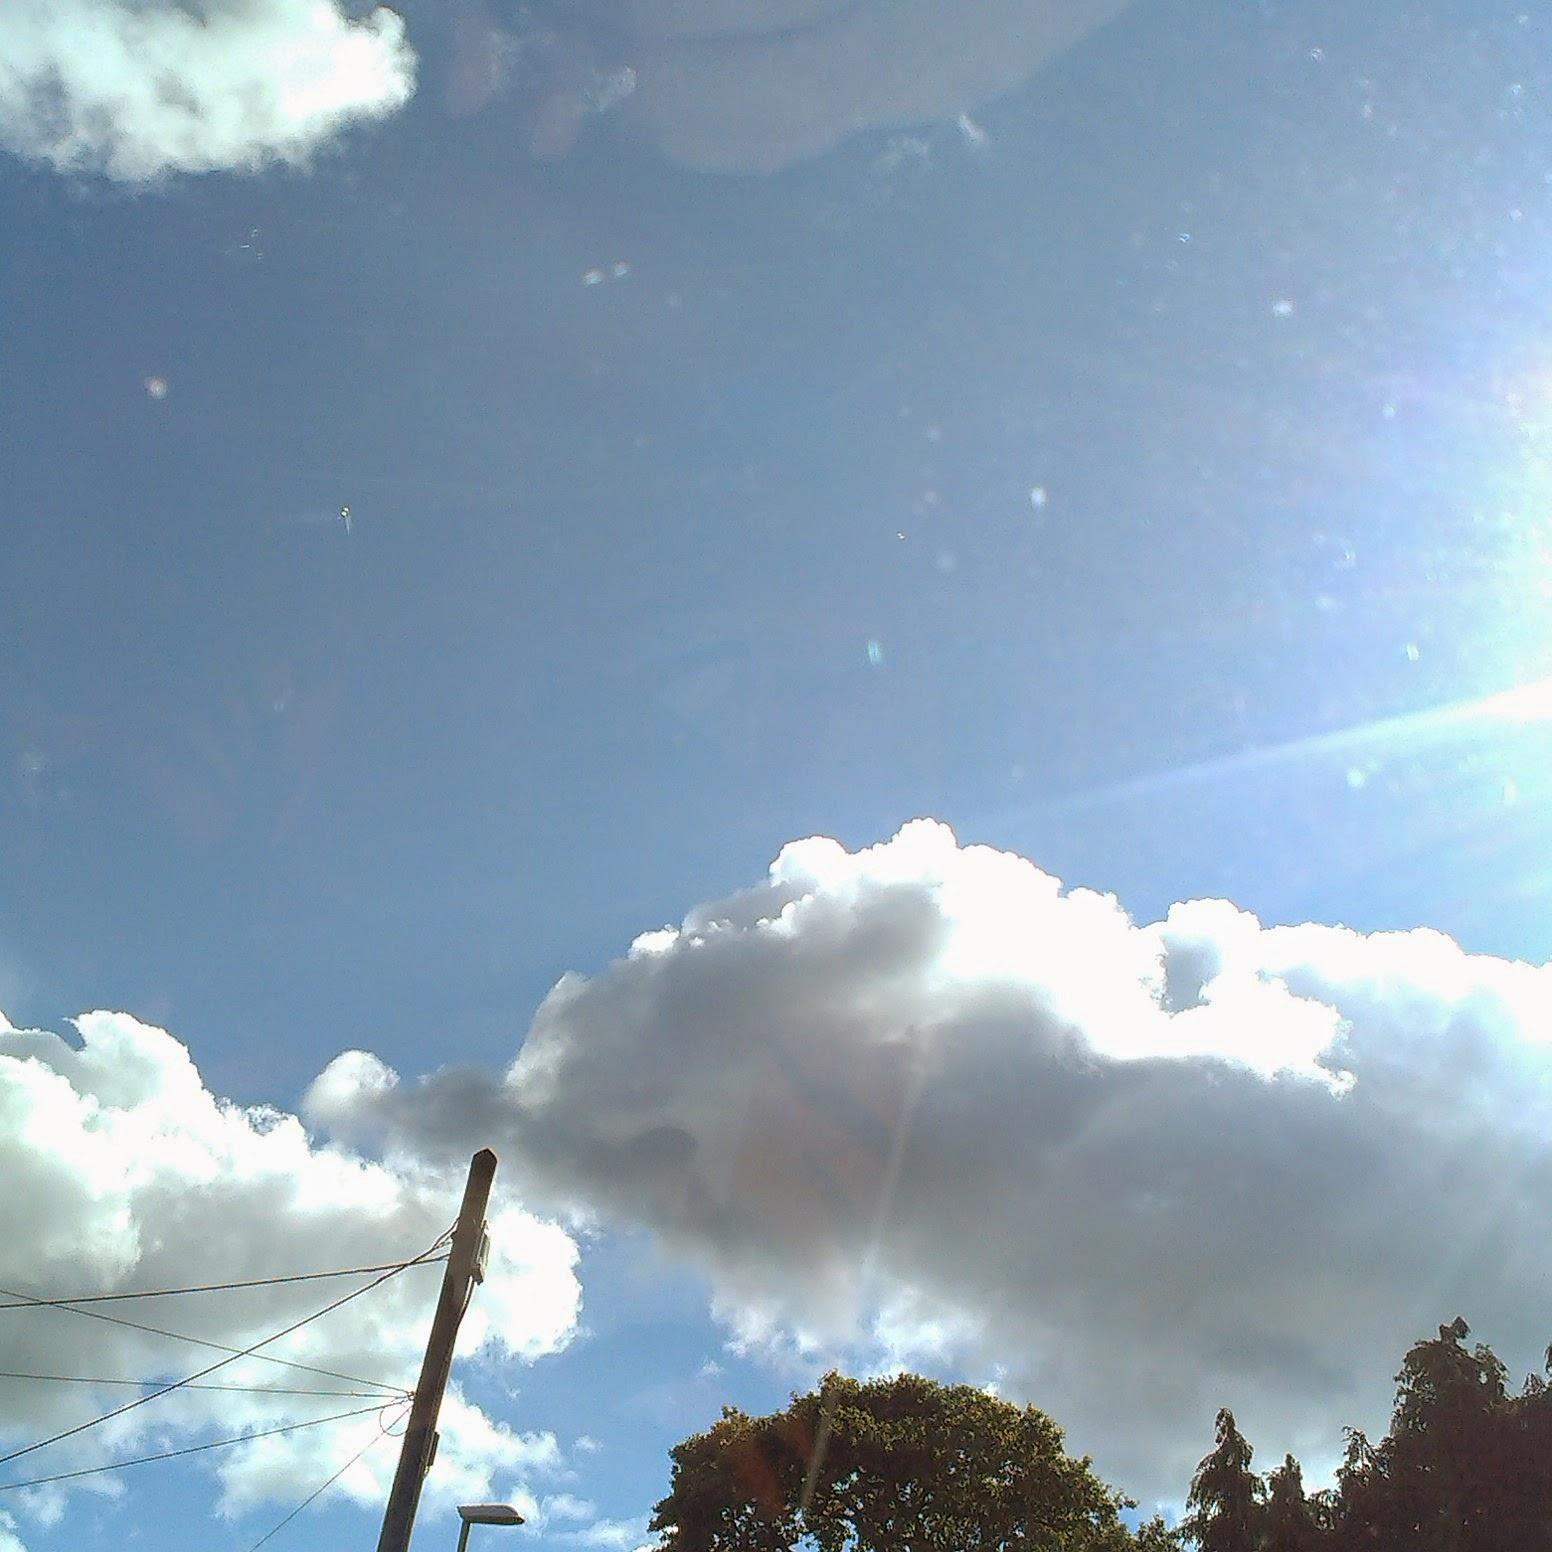 10am - blue sky